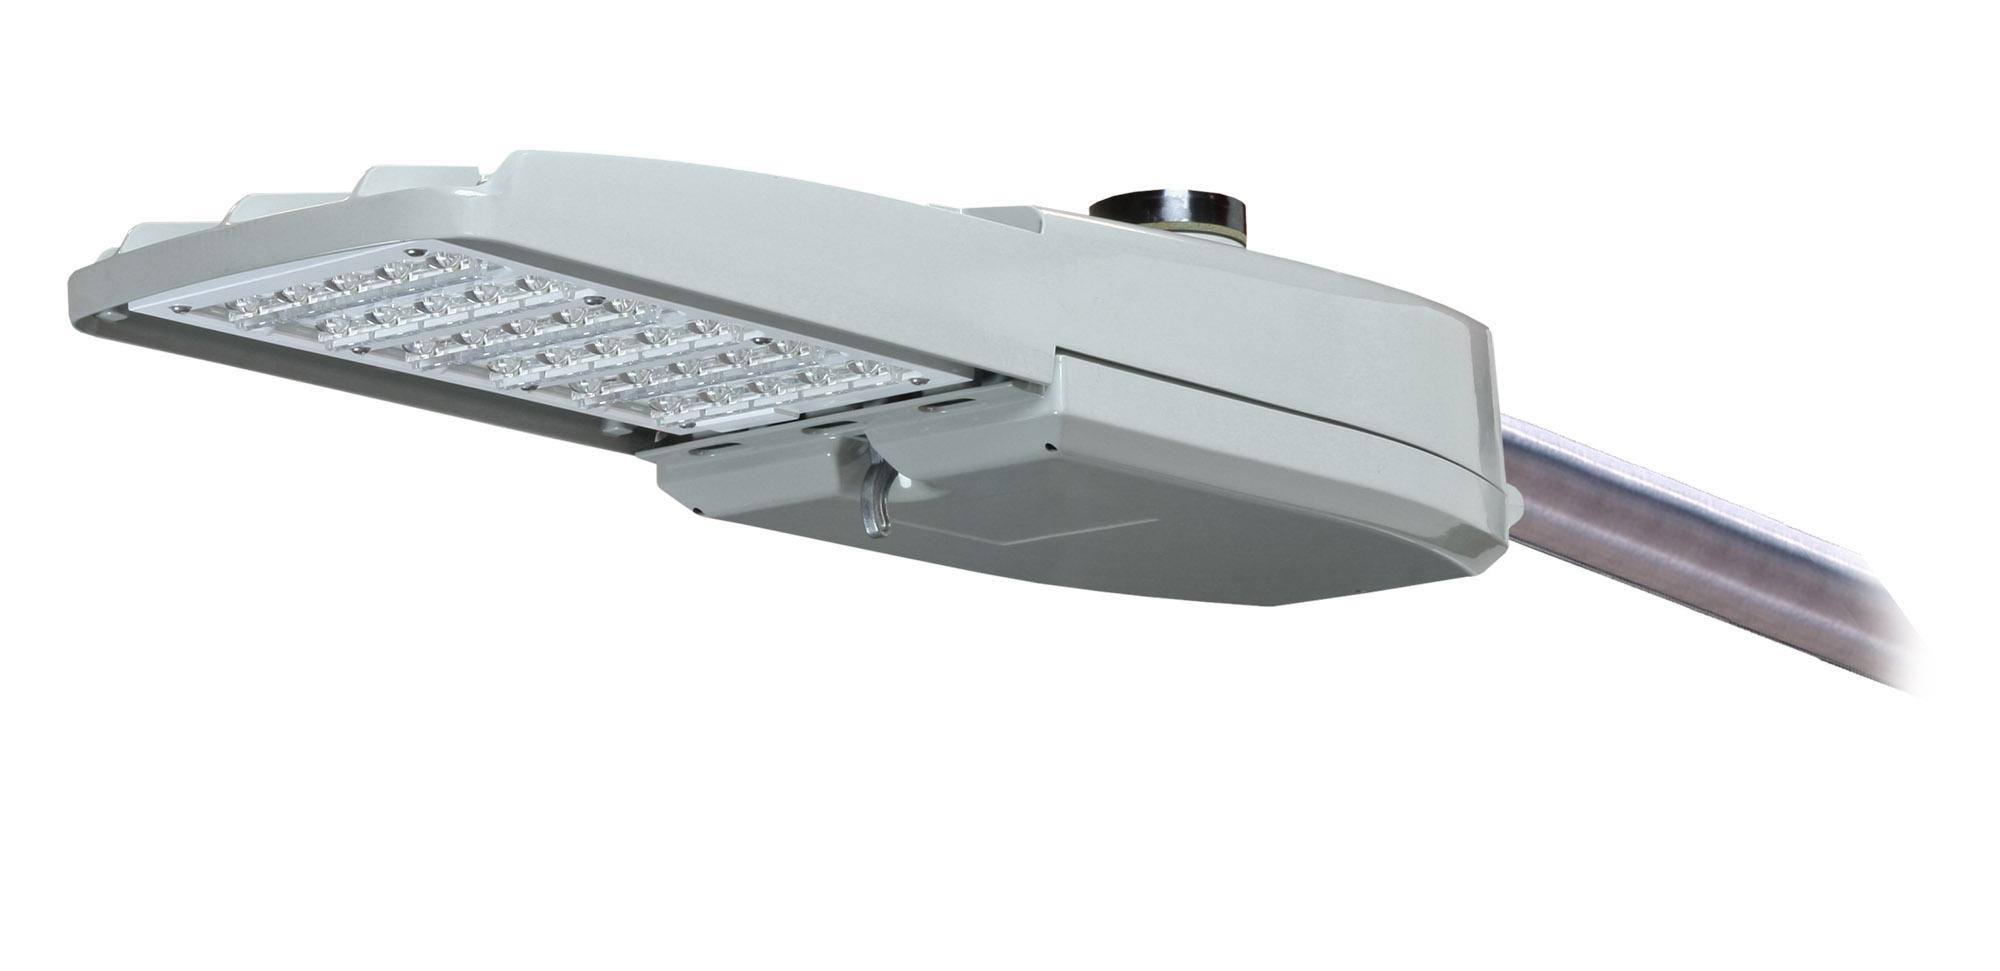 American Electric Lighting ATBM C MVOLT R2 P7 NL LED Roadway Street Light